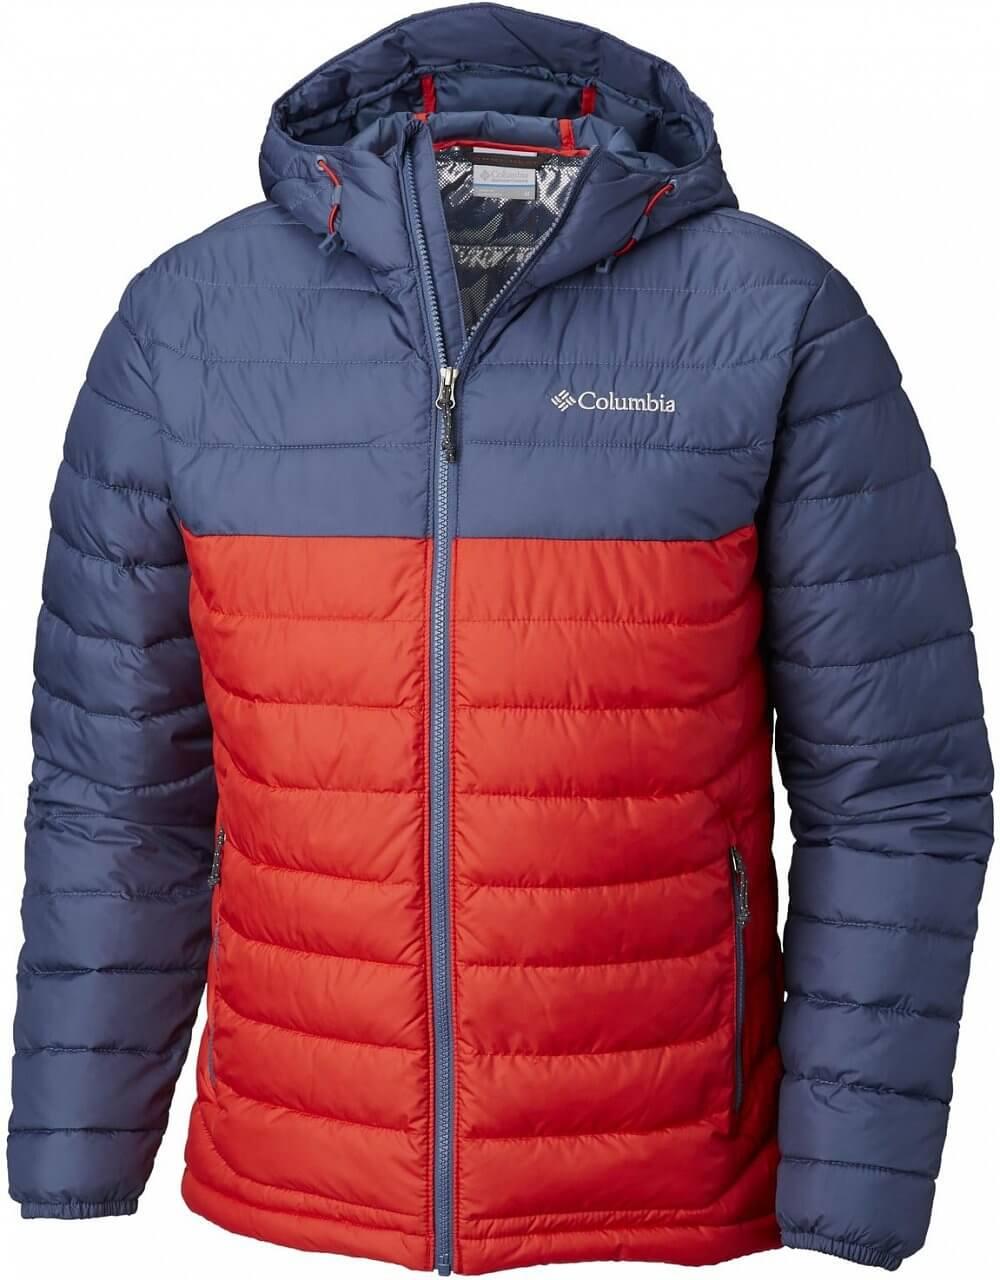 Pánská zimní bunda Columbia Powder Lite Hooded Jacket